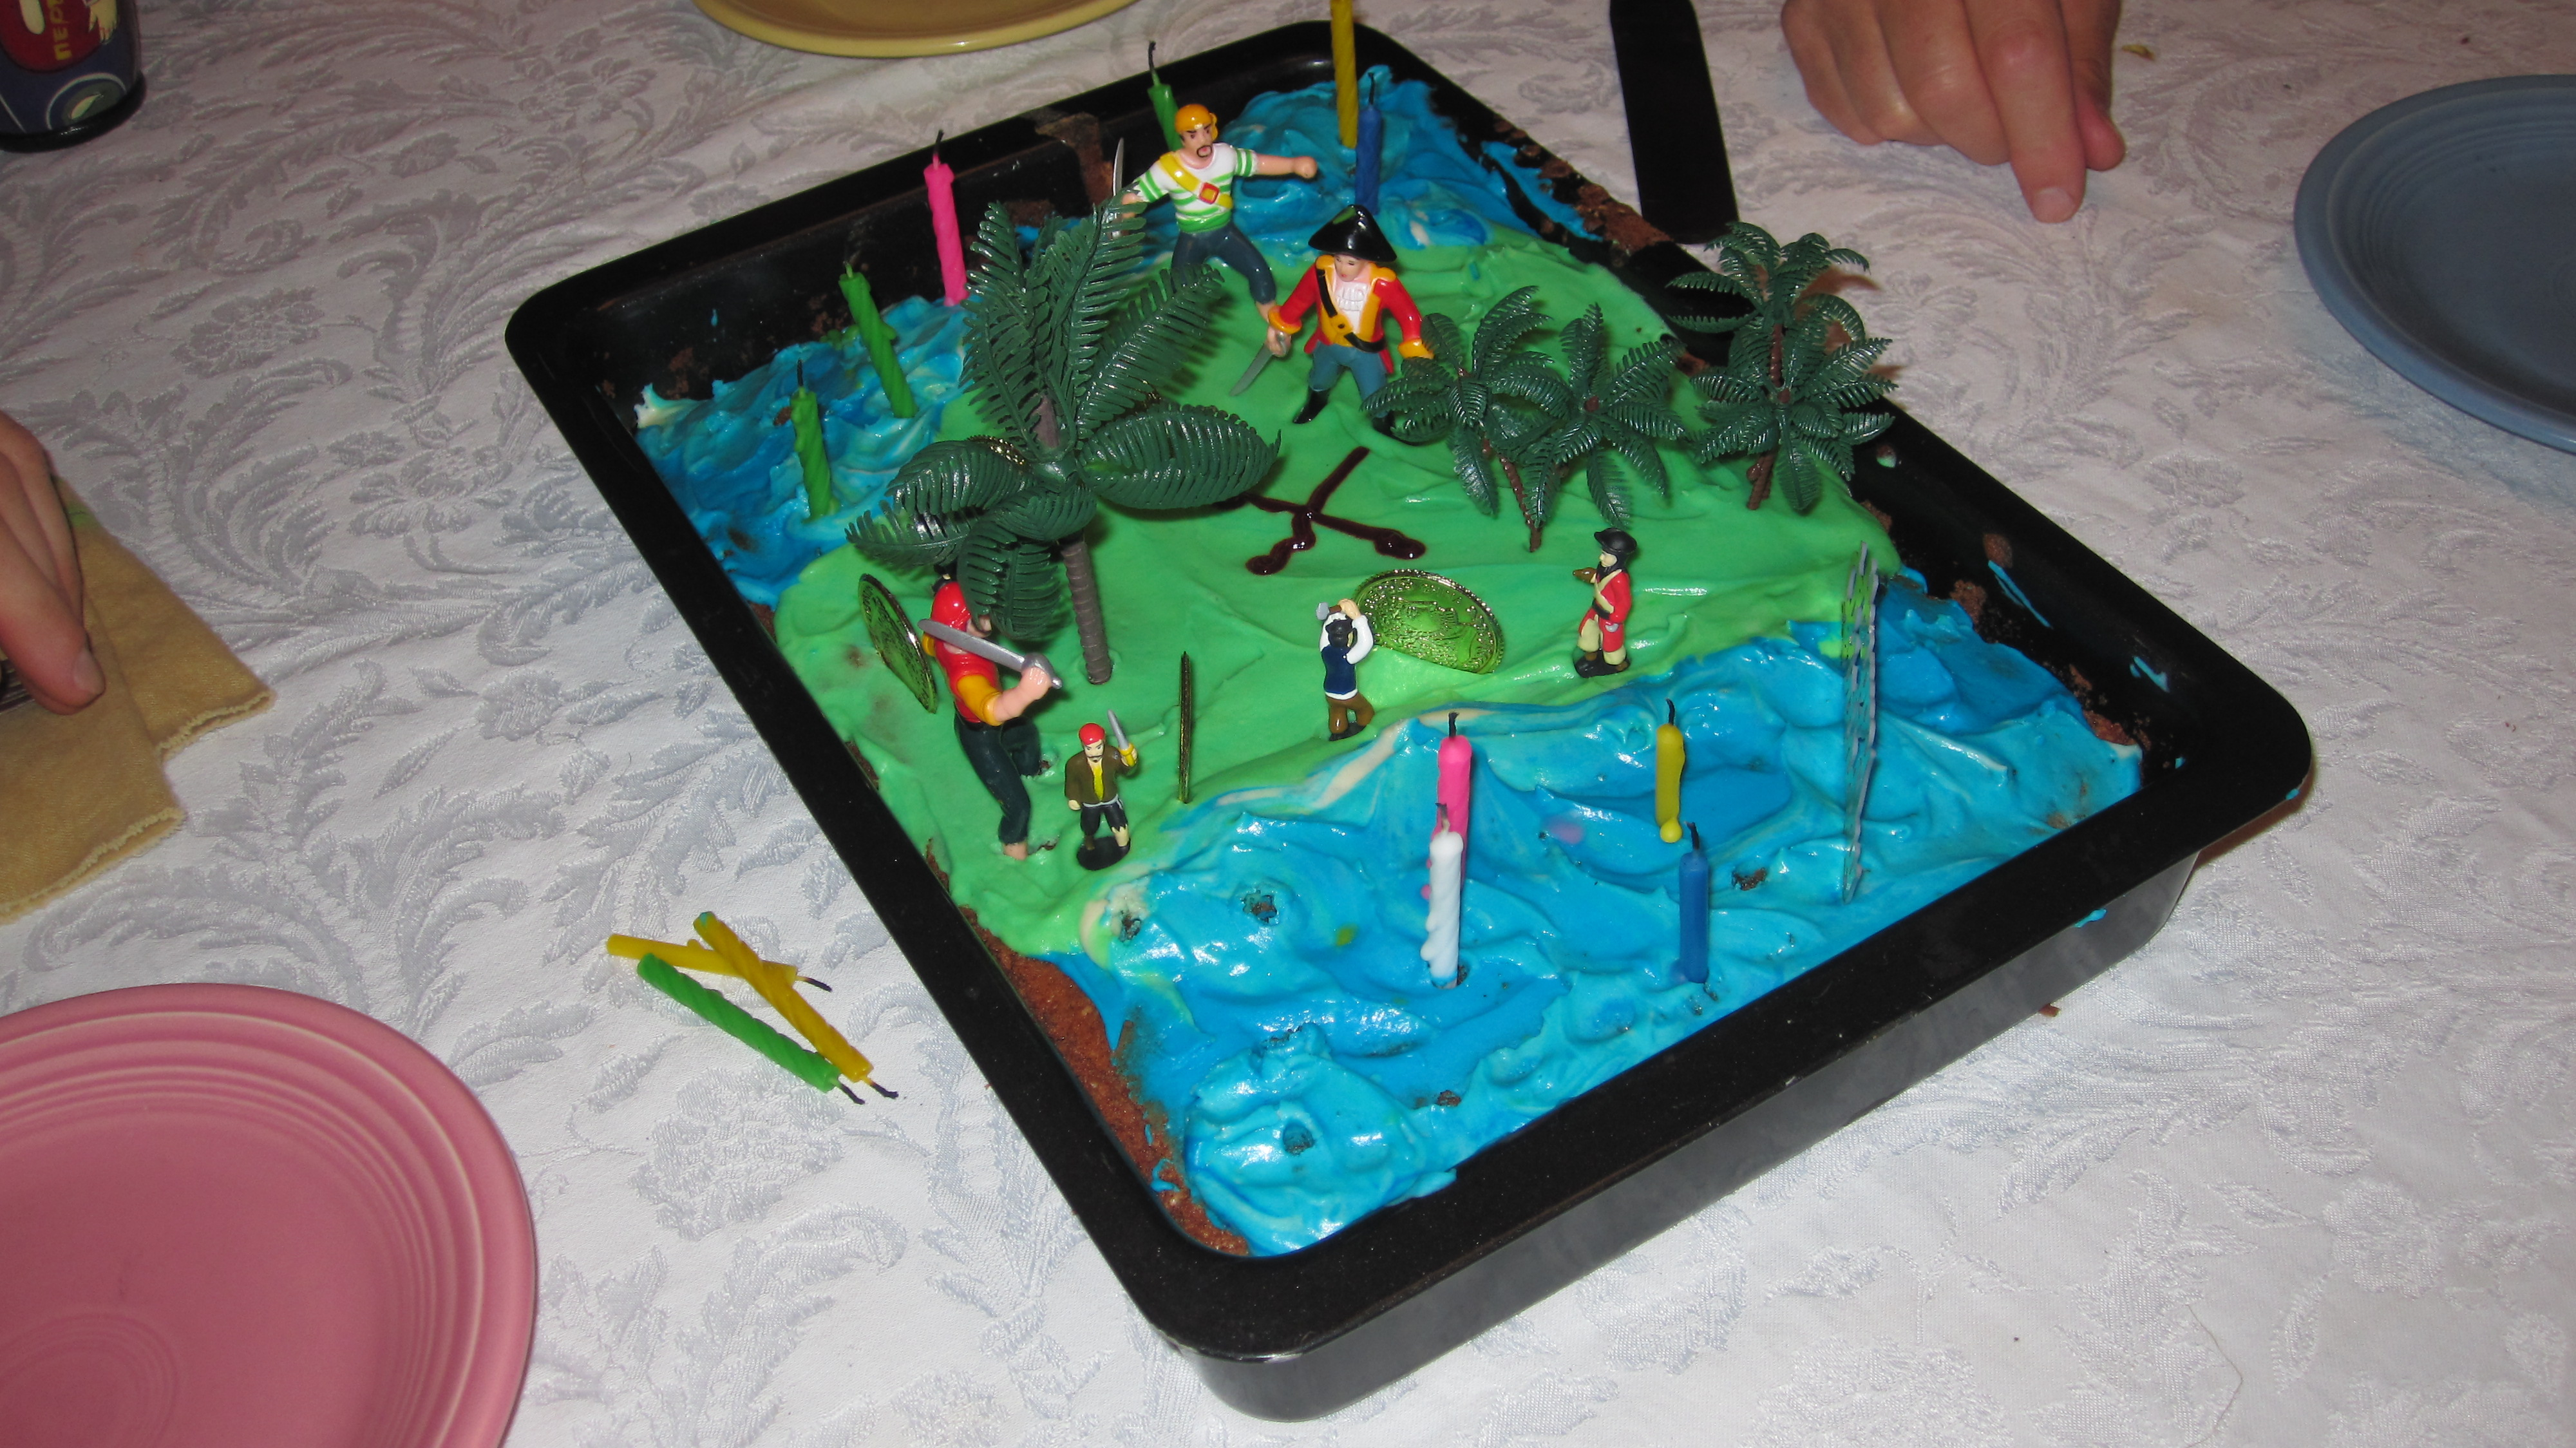 baking basics 101 Let Them Eat Birthday Cake from scratch club